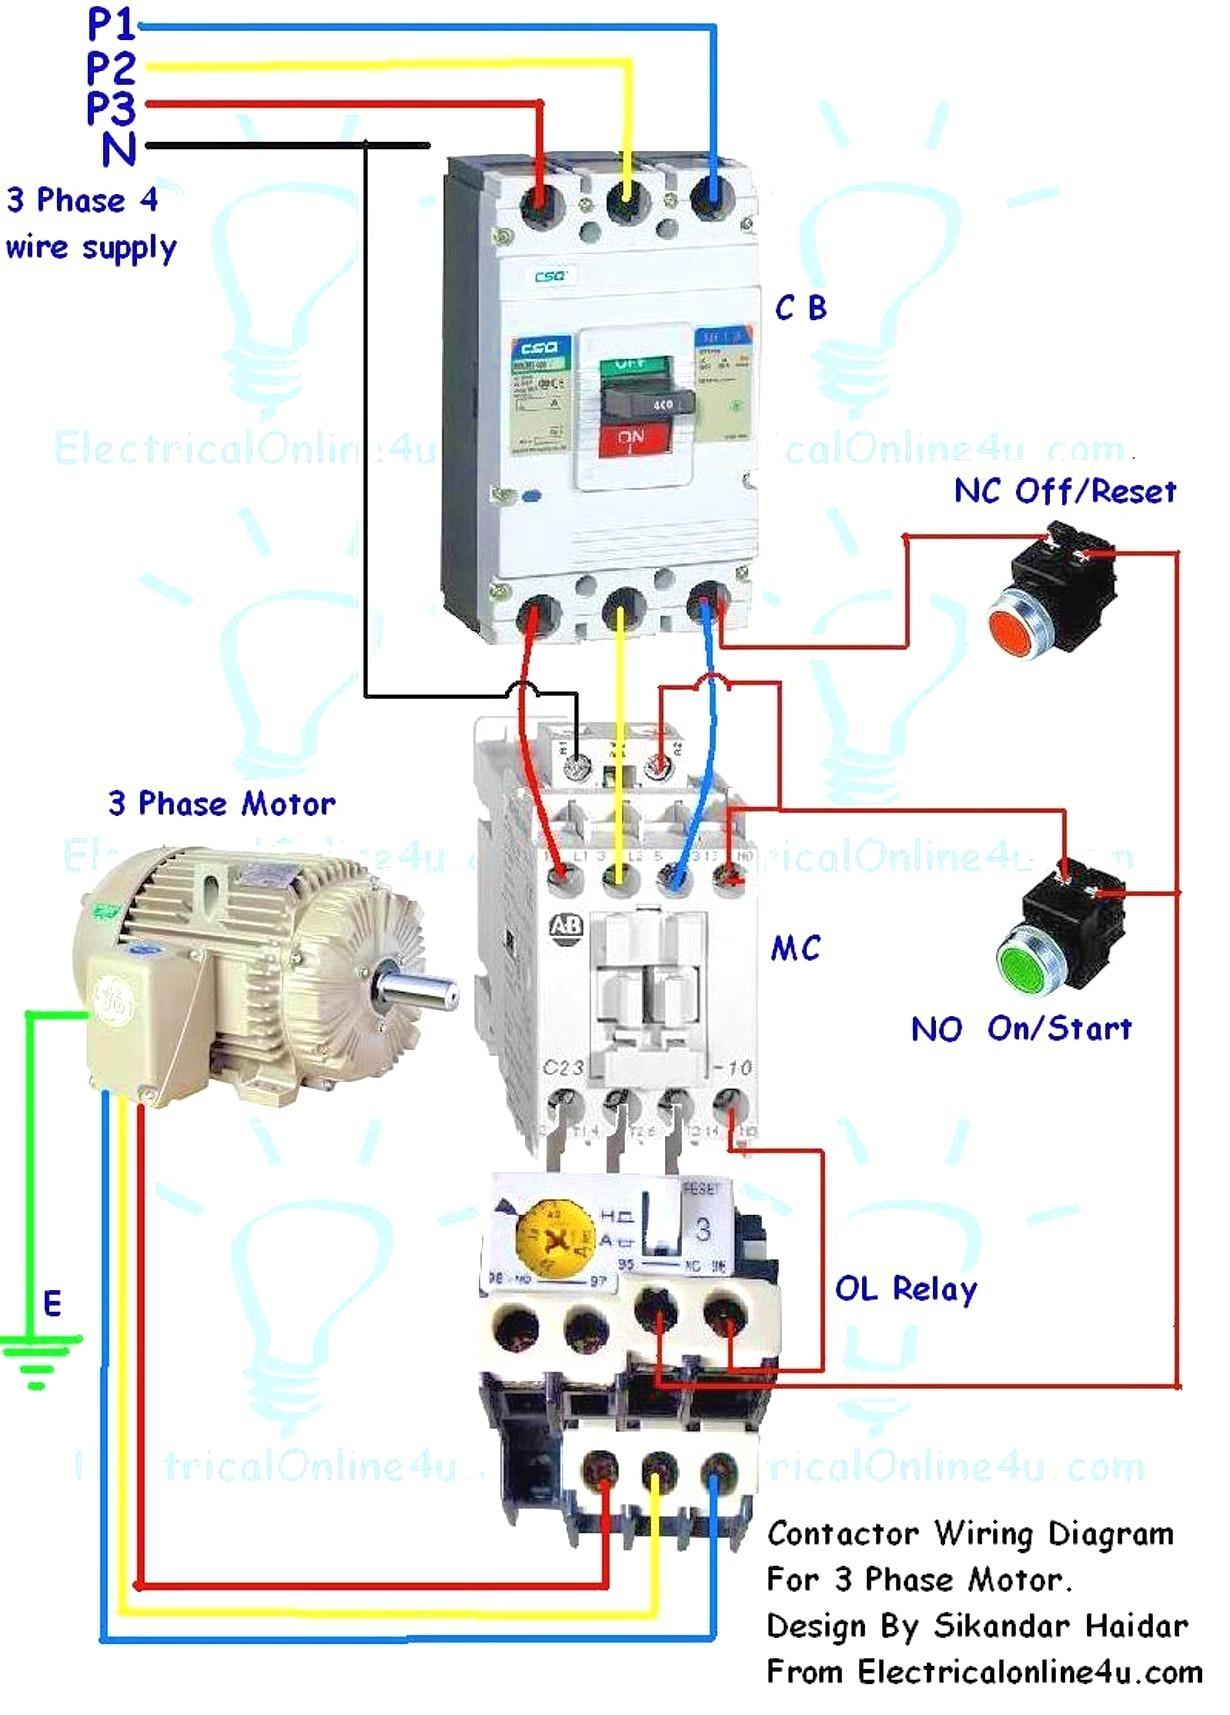 RF_5414] Electric Motor Contactor Wiring Diagram Wiring DiagramCular Eachi Barep Barba Mohammedshrine Librar Wiring 101